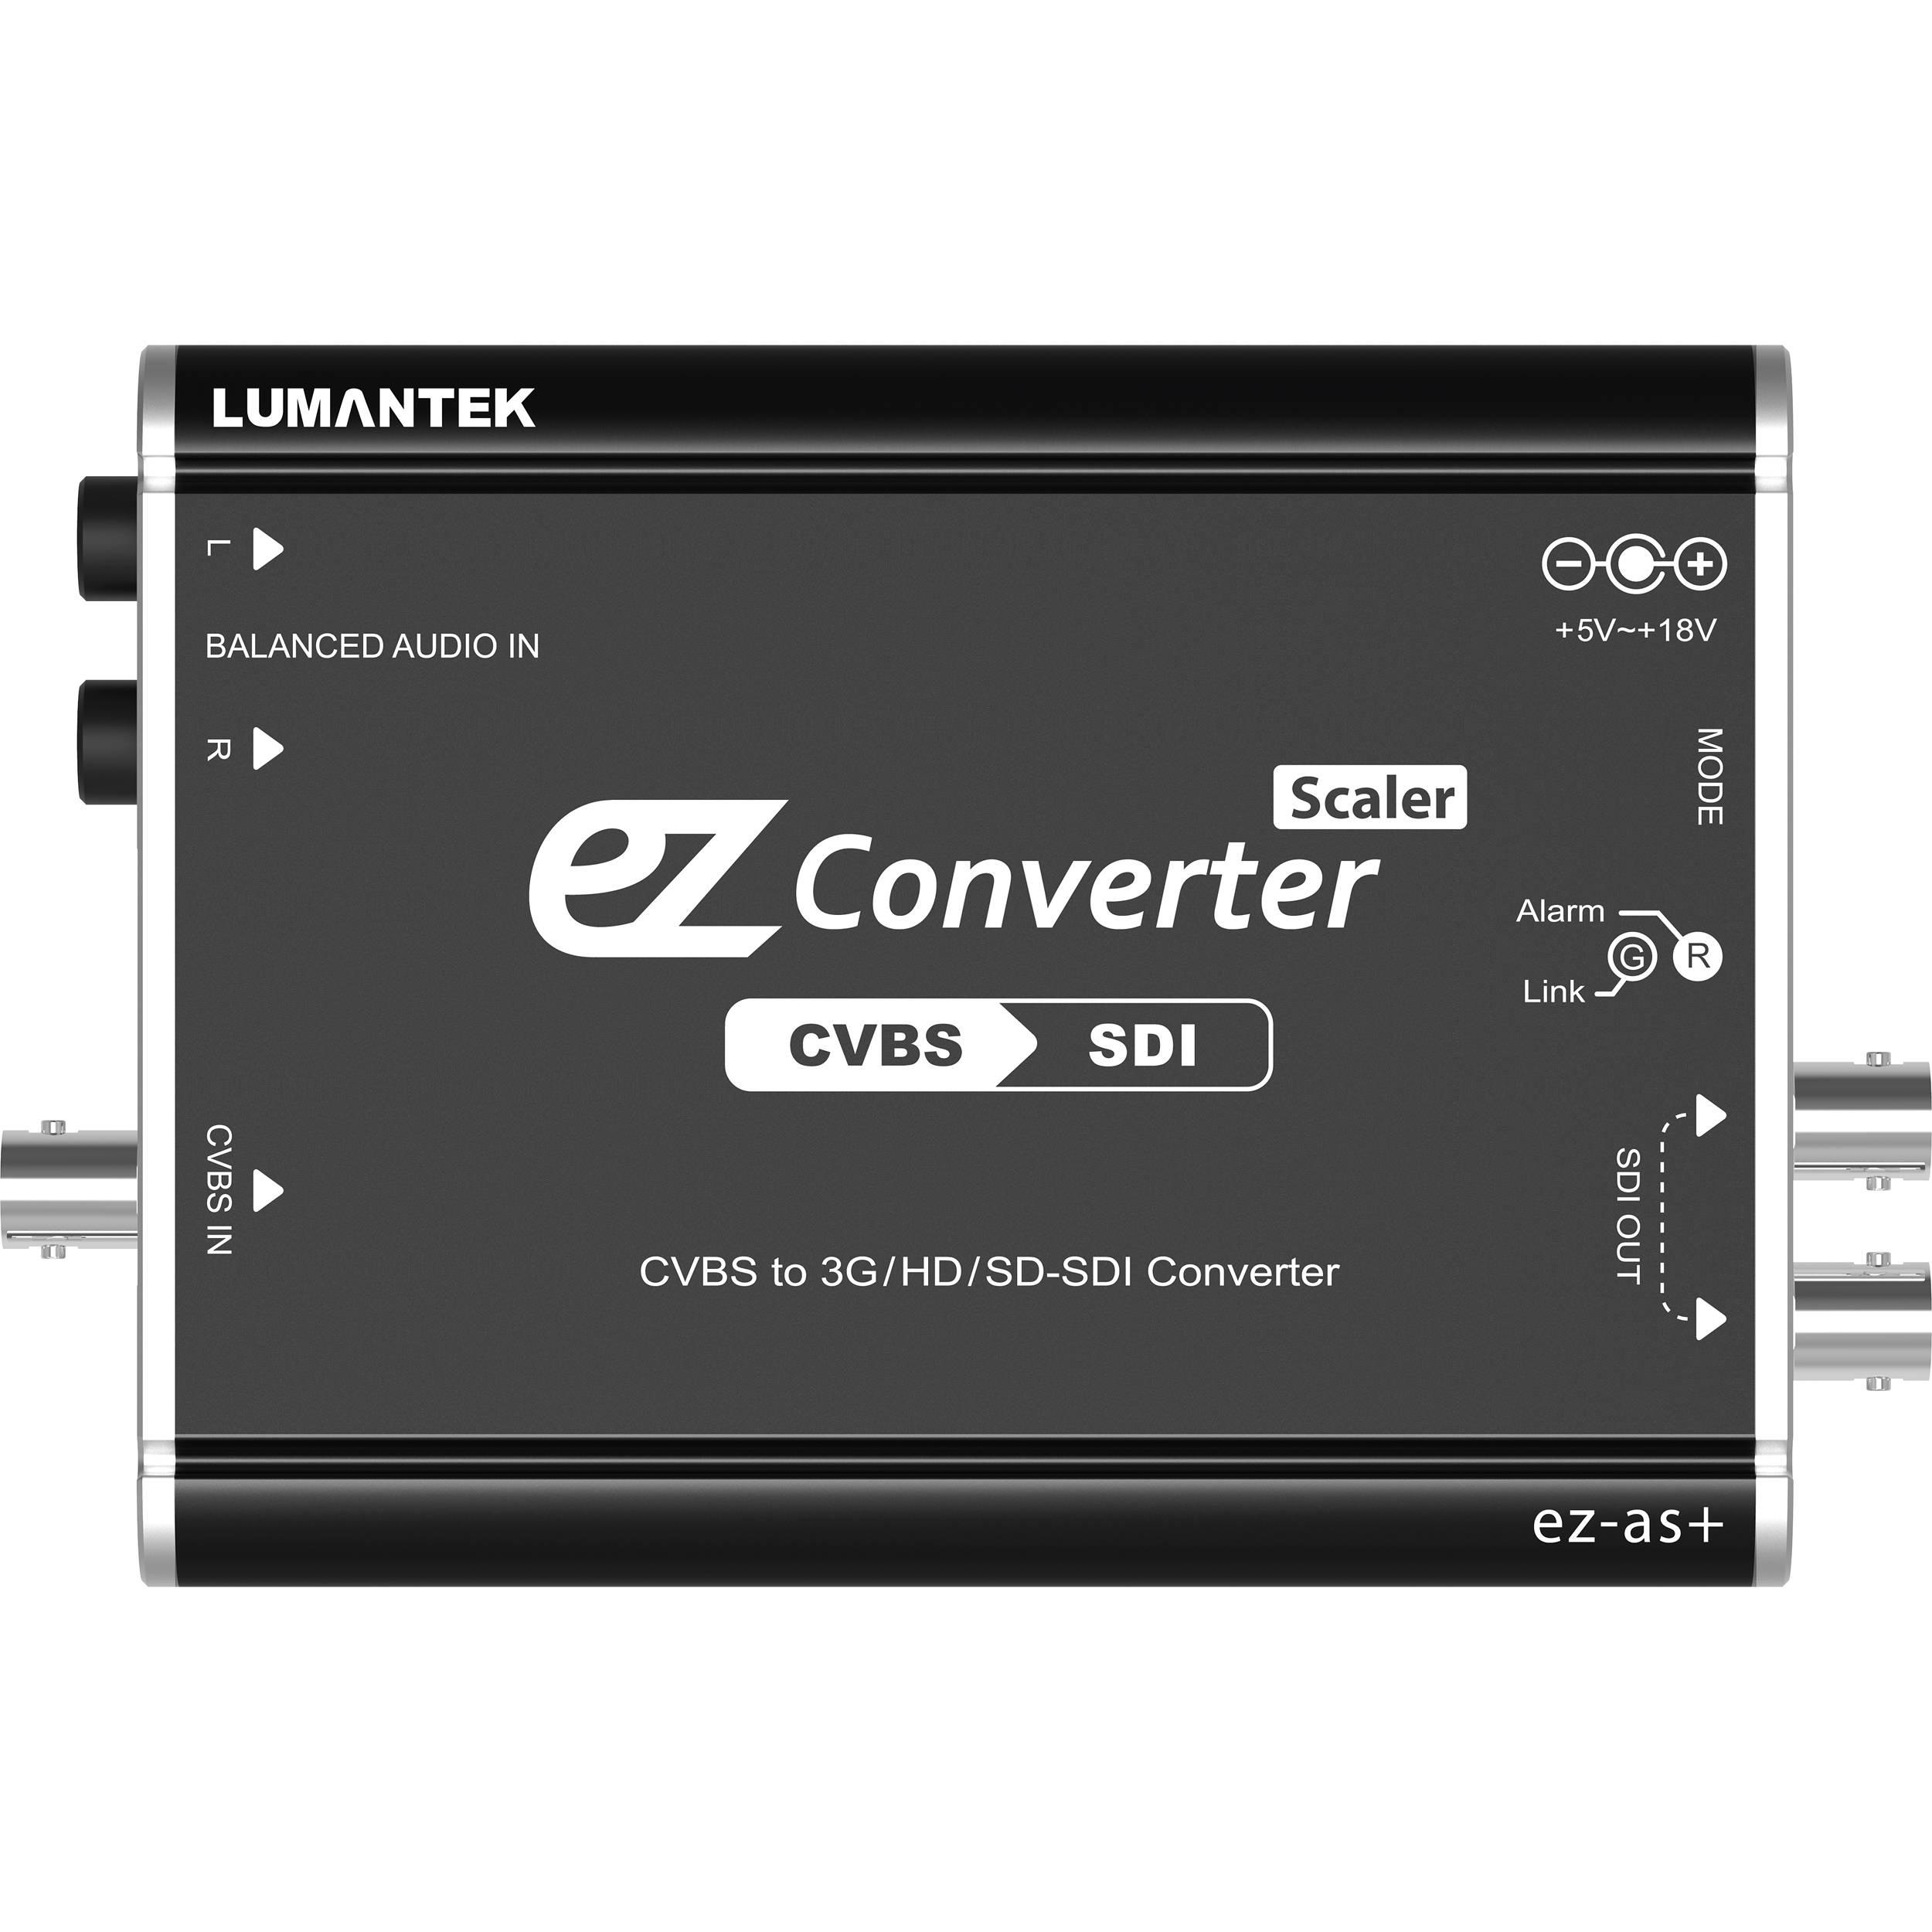 Lumantek Cvbs To 3g Hd Sd Sdi Converter Ez As Bh Rbvhda8 Sdsdi 1 Input 8 Output Video Distribution Amplifier With Scaler